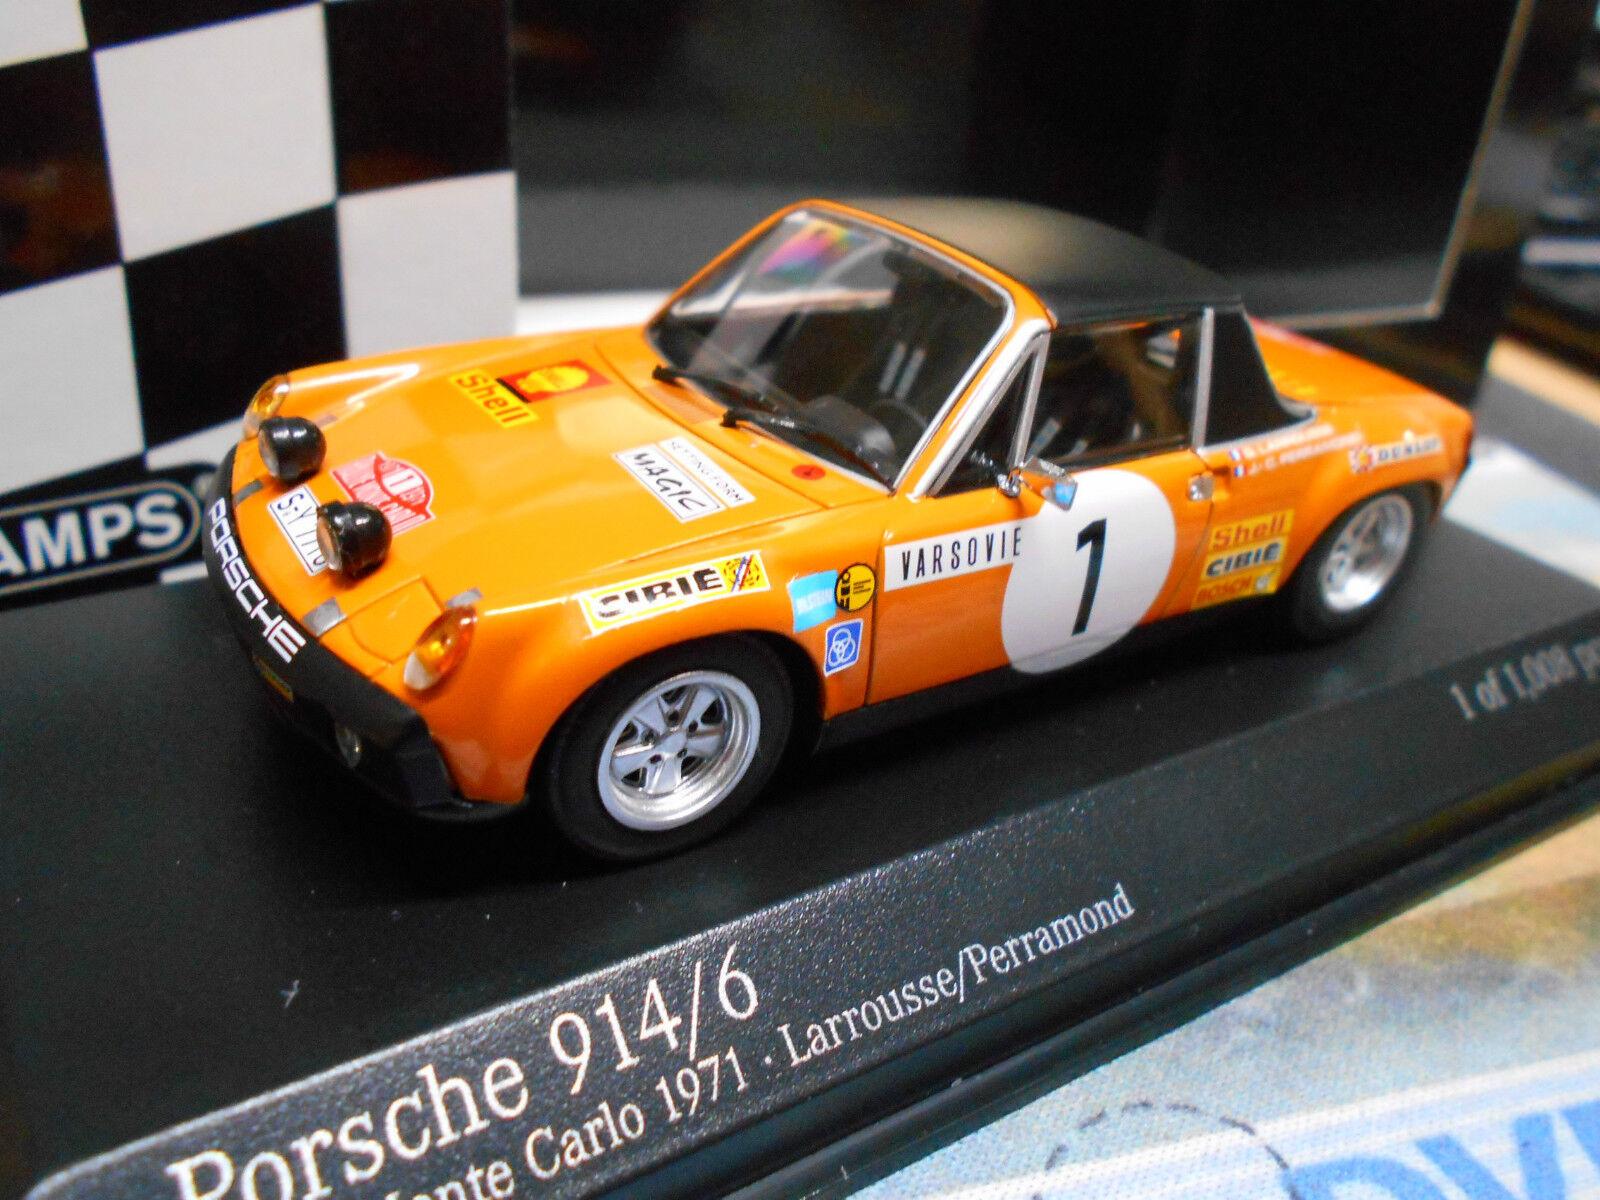 Porsche 914 6 914 6 Rallye Monte Carlo 1971  1 Larrousse perra MINICHAMPS 1 43